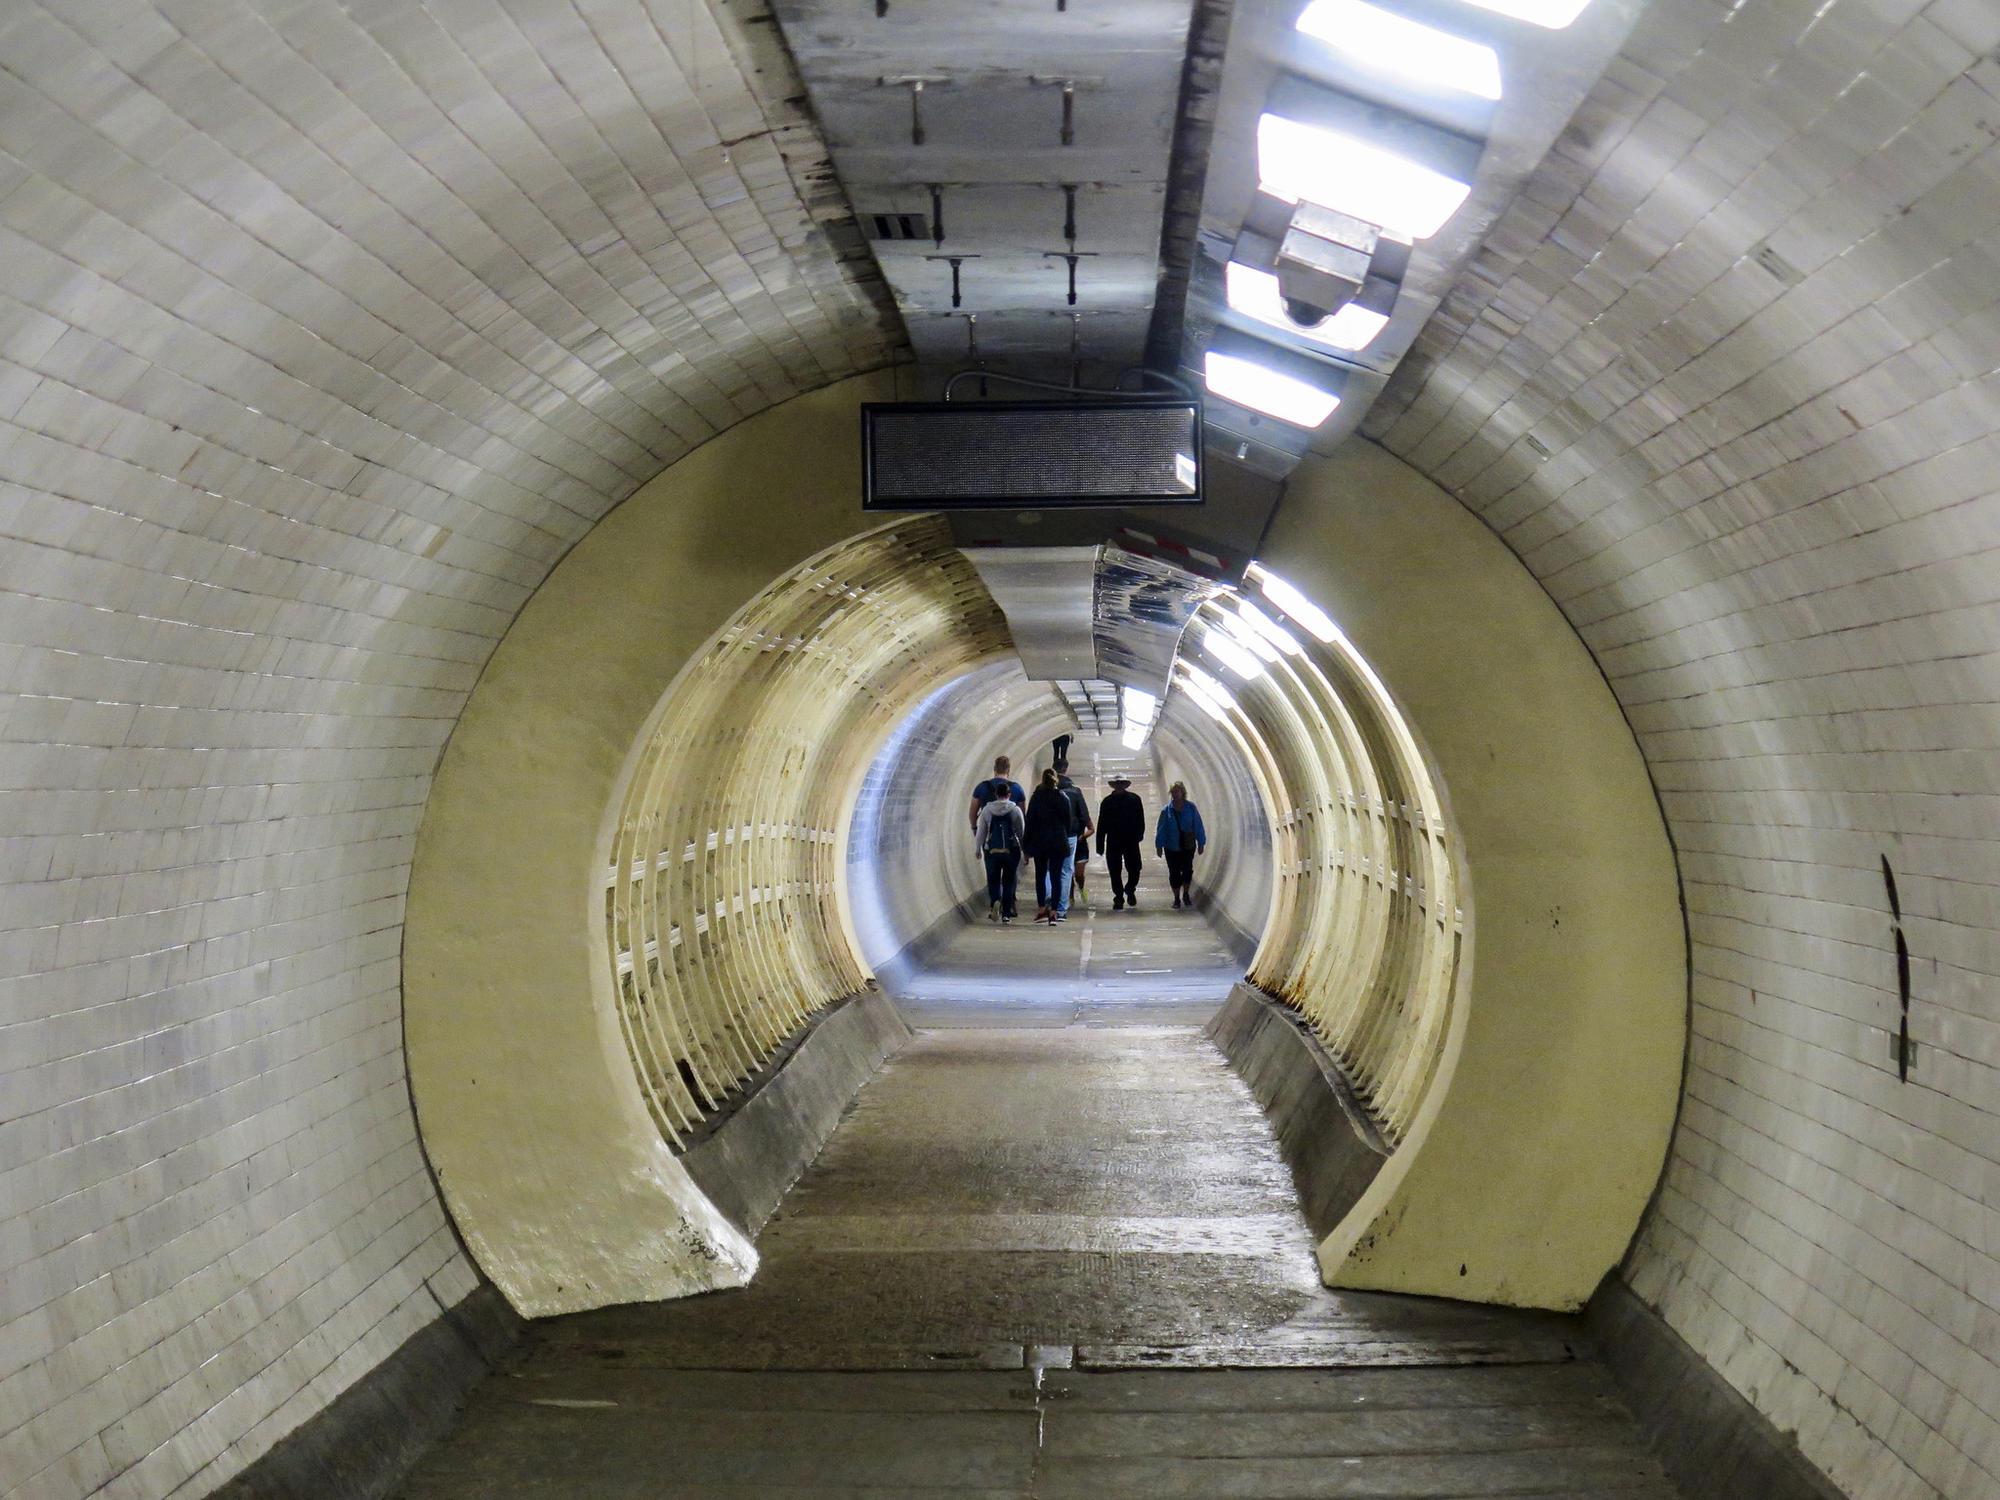 London tunnels